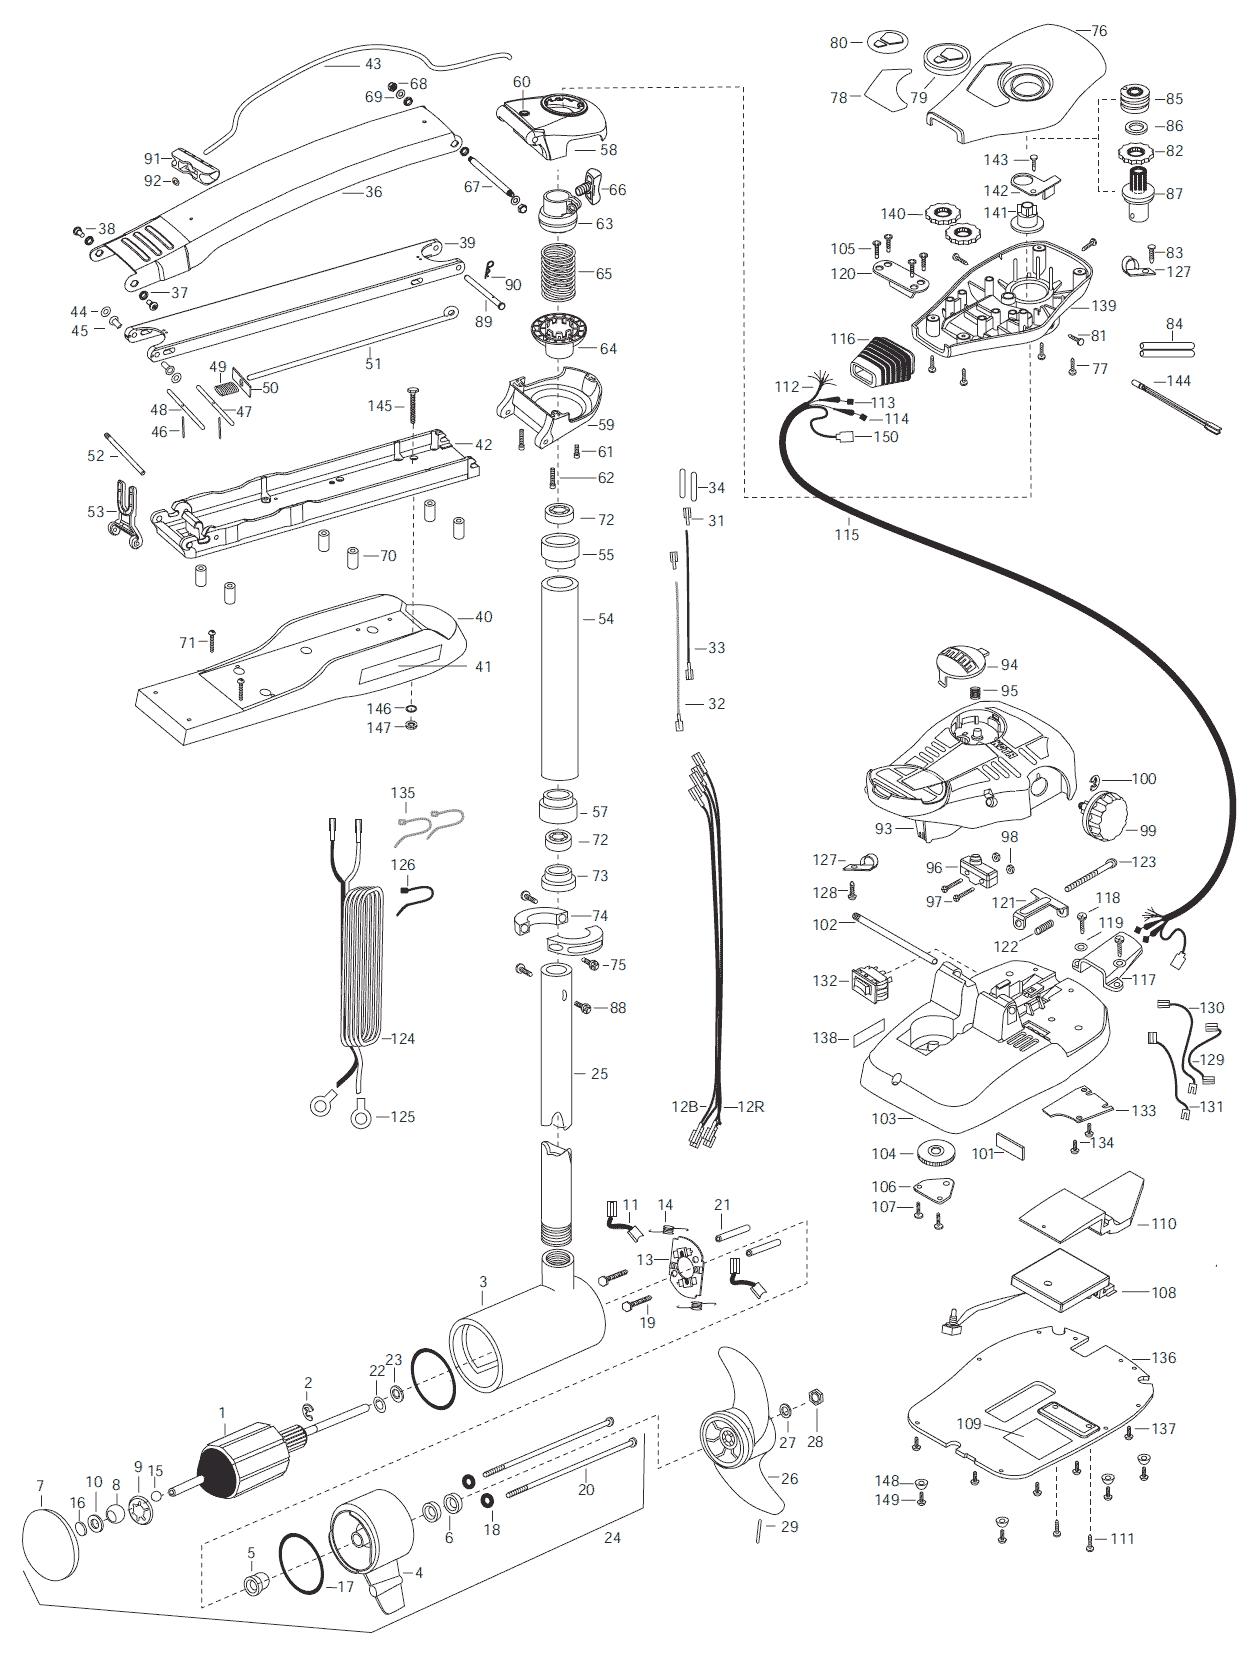 Minn Kota Maxxum 74 52 Inch With Sonar Parts